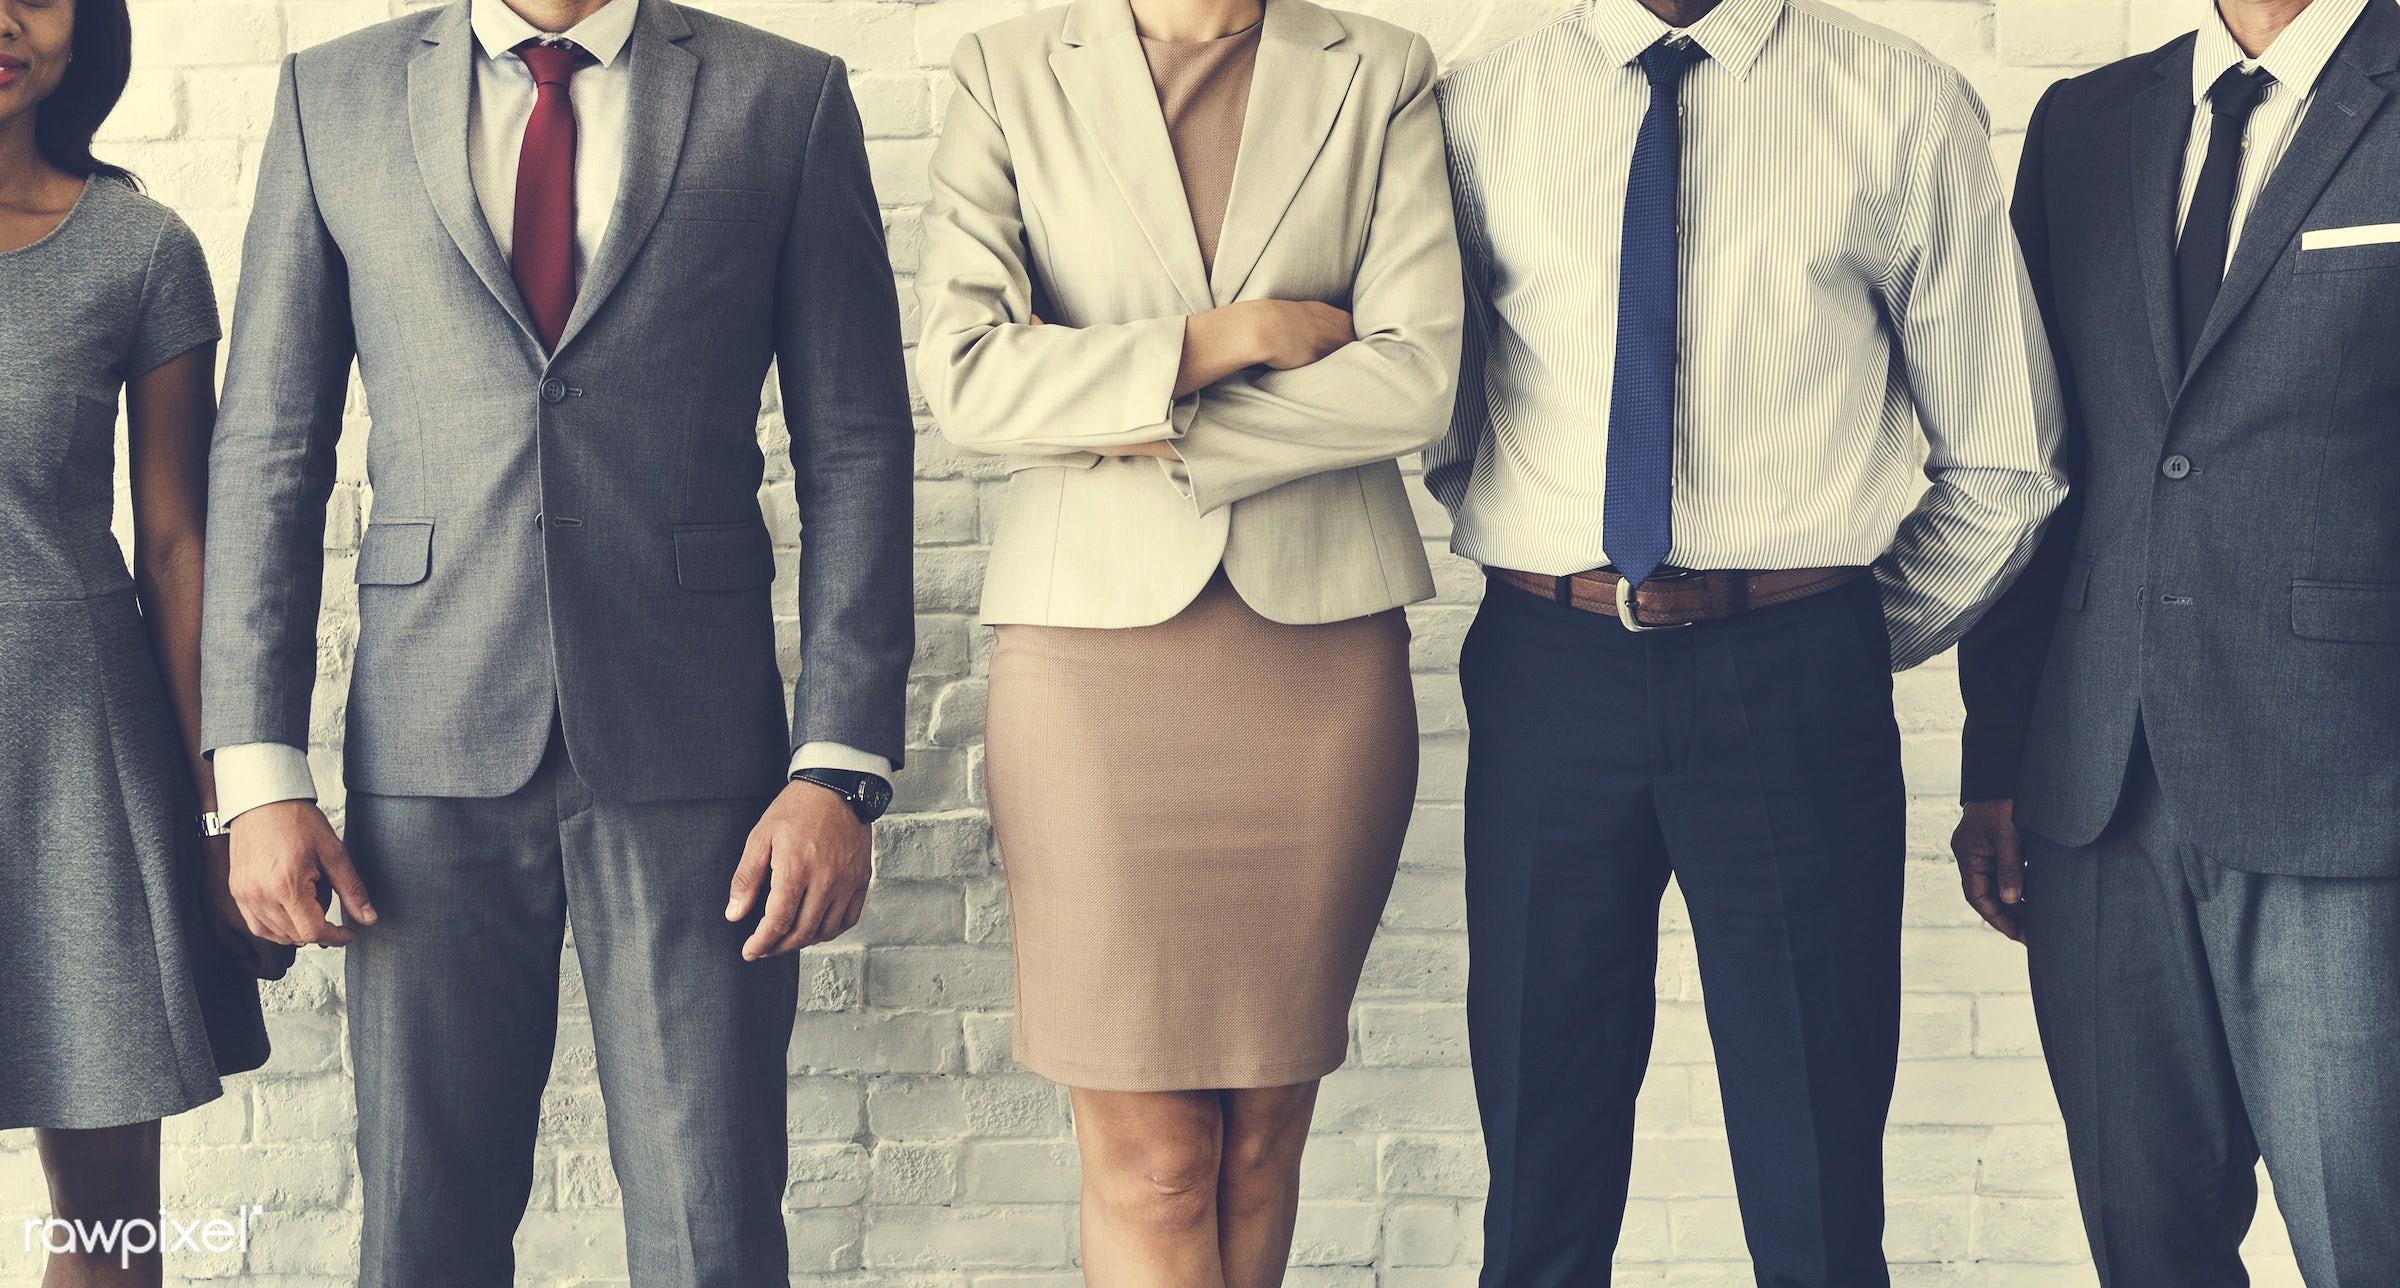 assistance, variation, analysing, corporation, people, business, teamwork, friends, friendship, coworker, men, financial,...